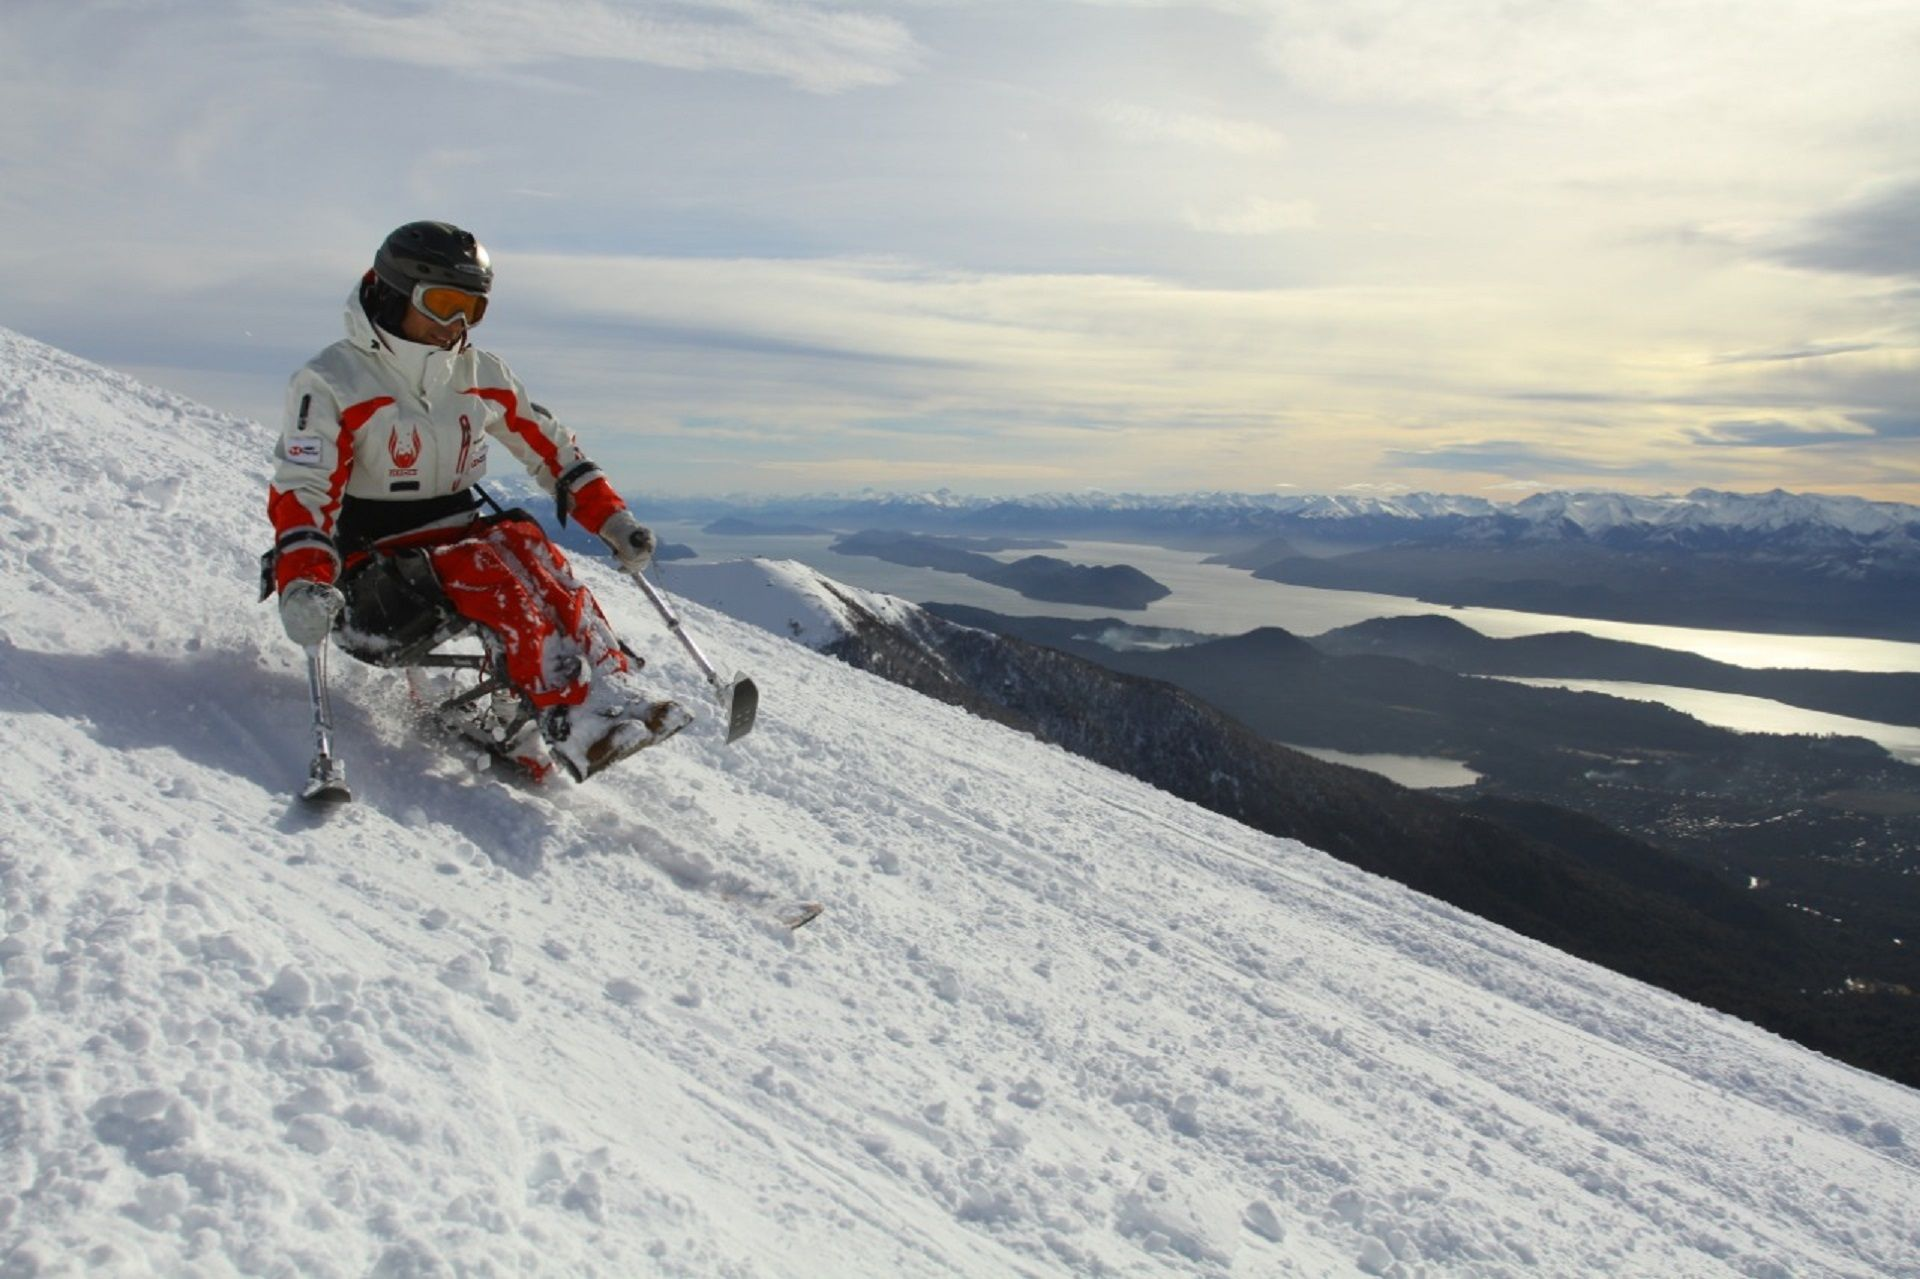 sans-serif; font-size: 9pt;>Germán Vega el primer instructor de esquí en sillas de ruedas del mundo